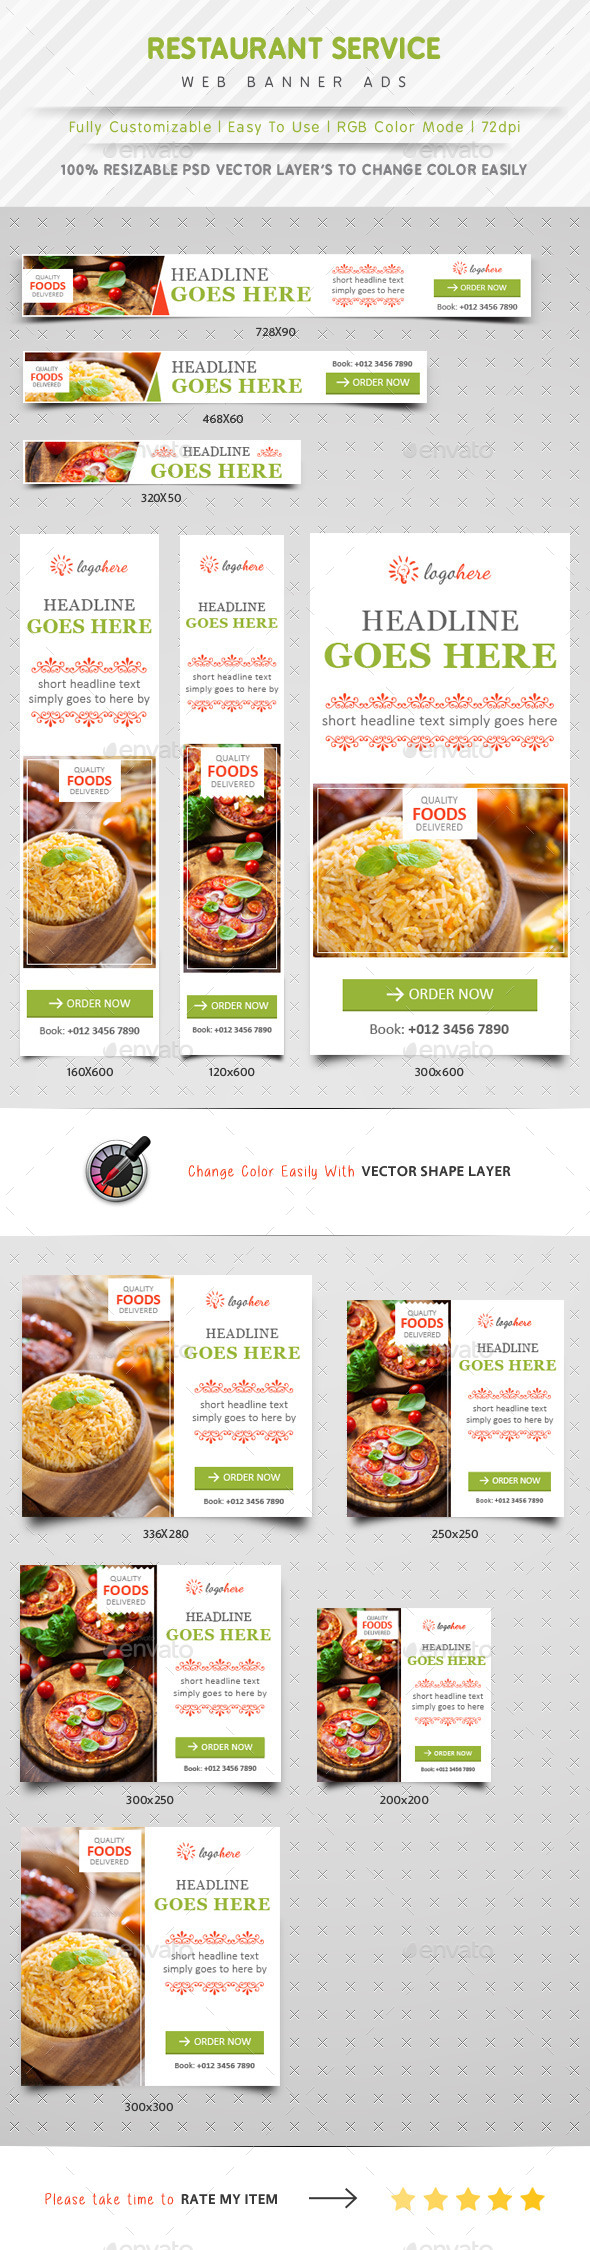 GraphicRiver Restaurant Service Web Banner Ads 10690283